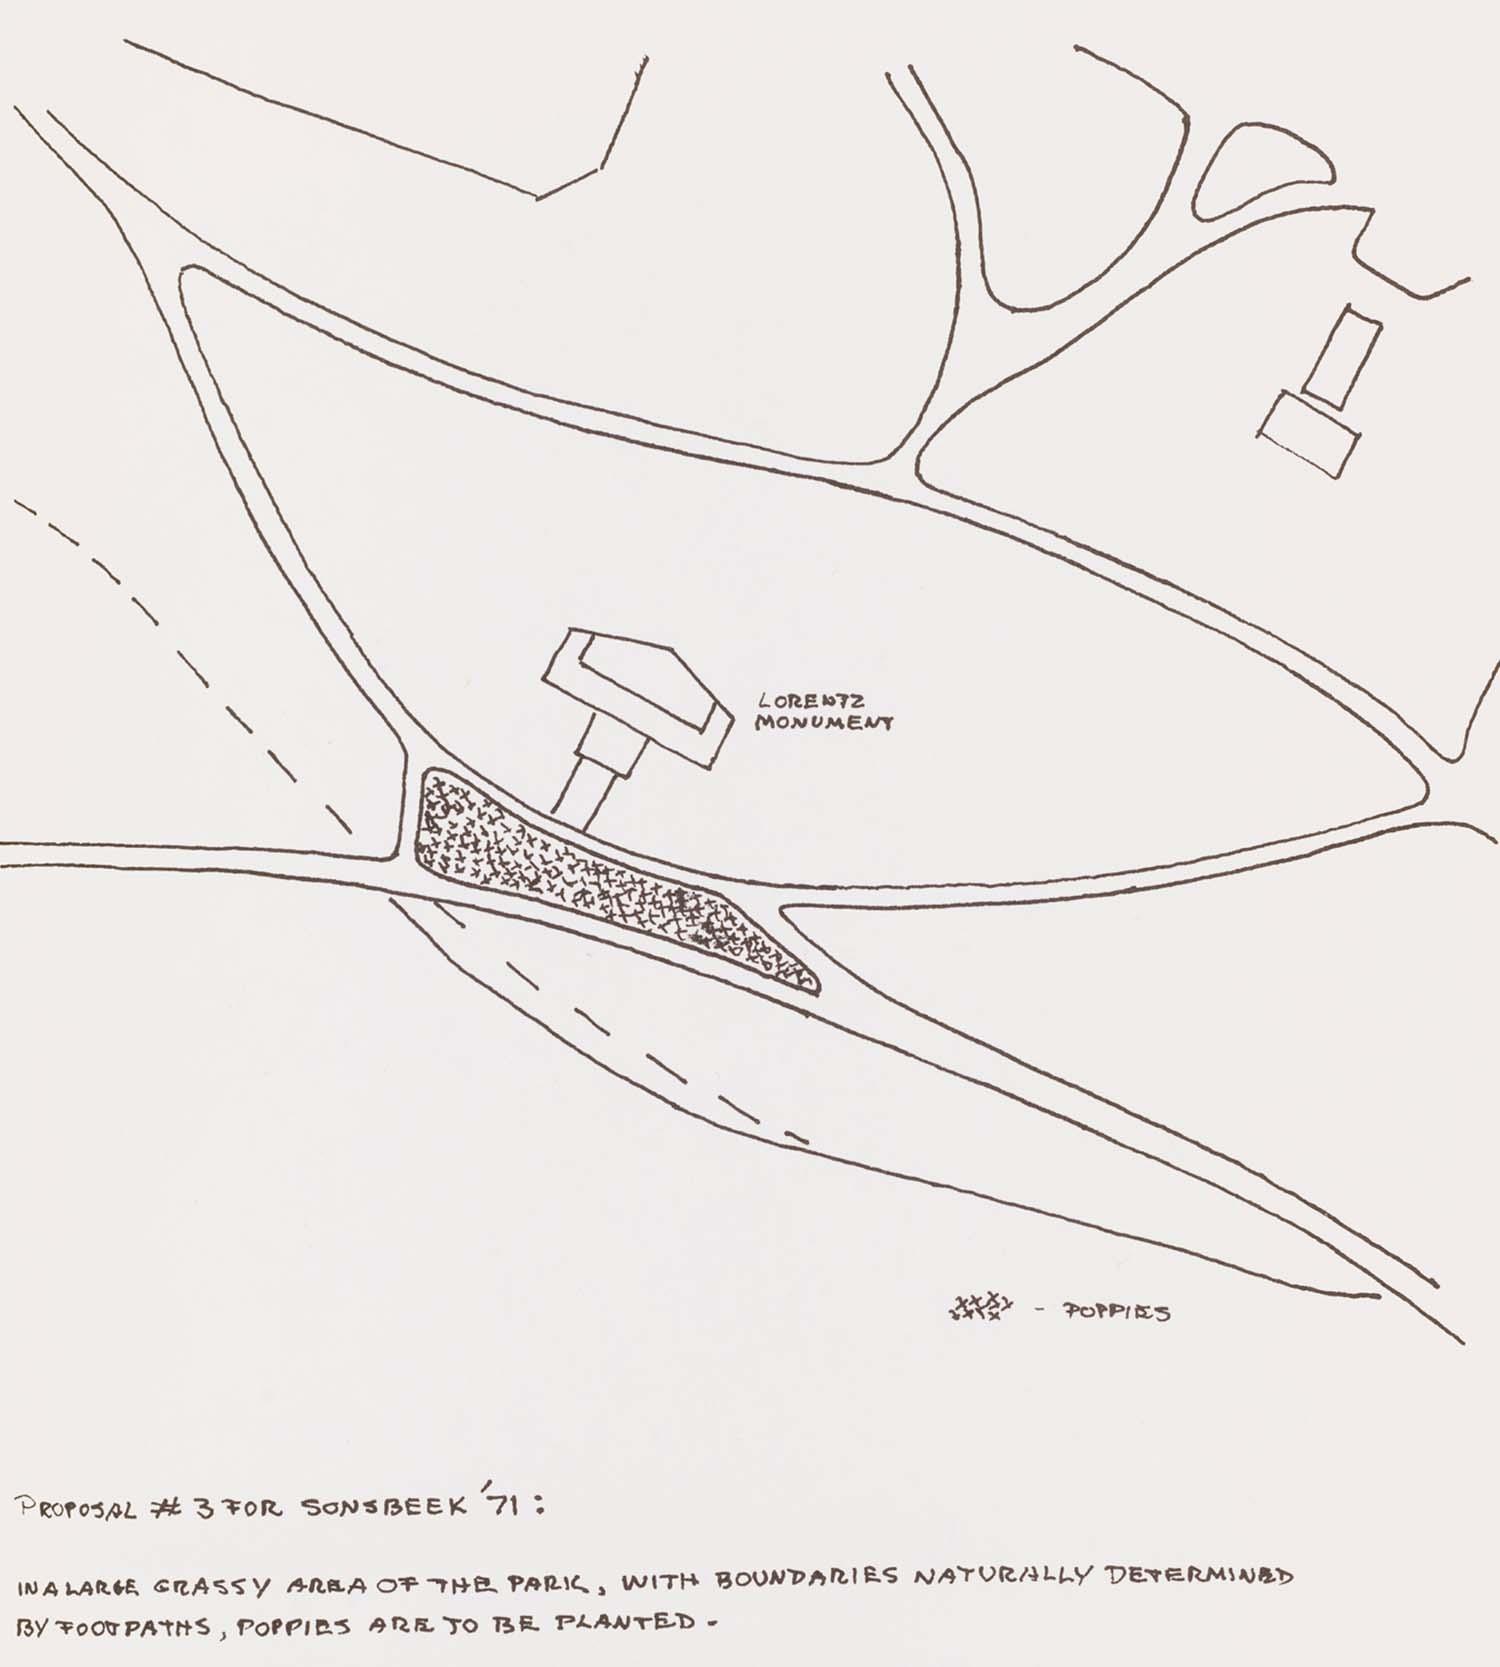 <i>Sonsbeek 71</i>, Arnhem, proposal